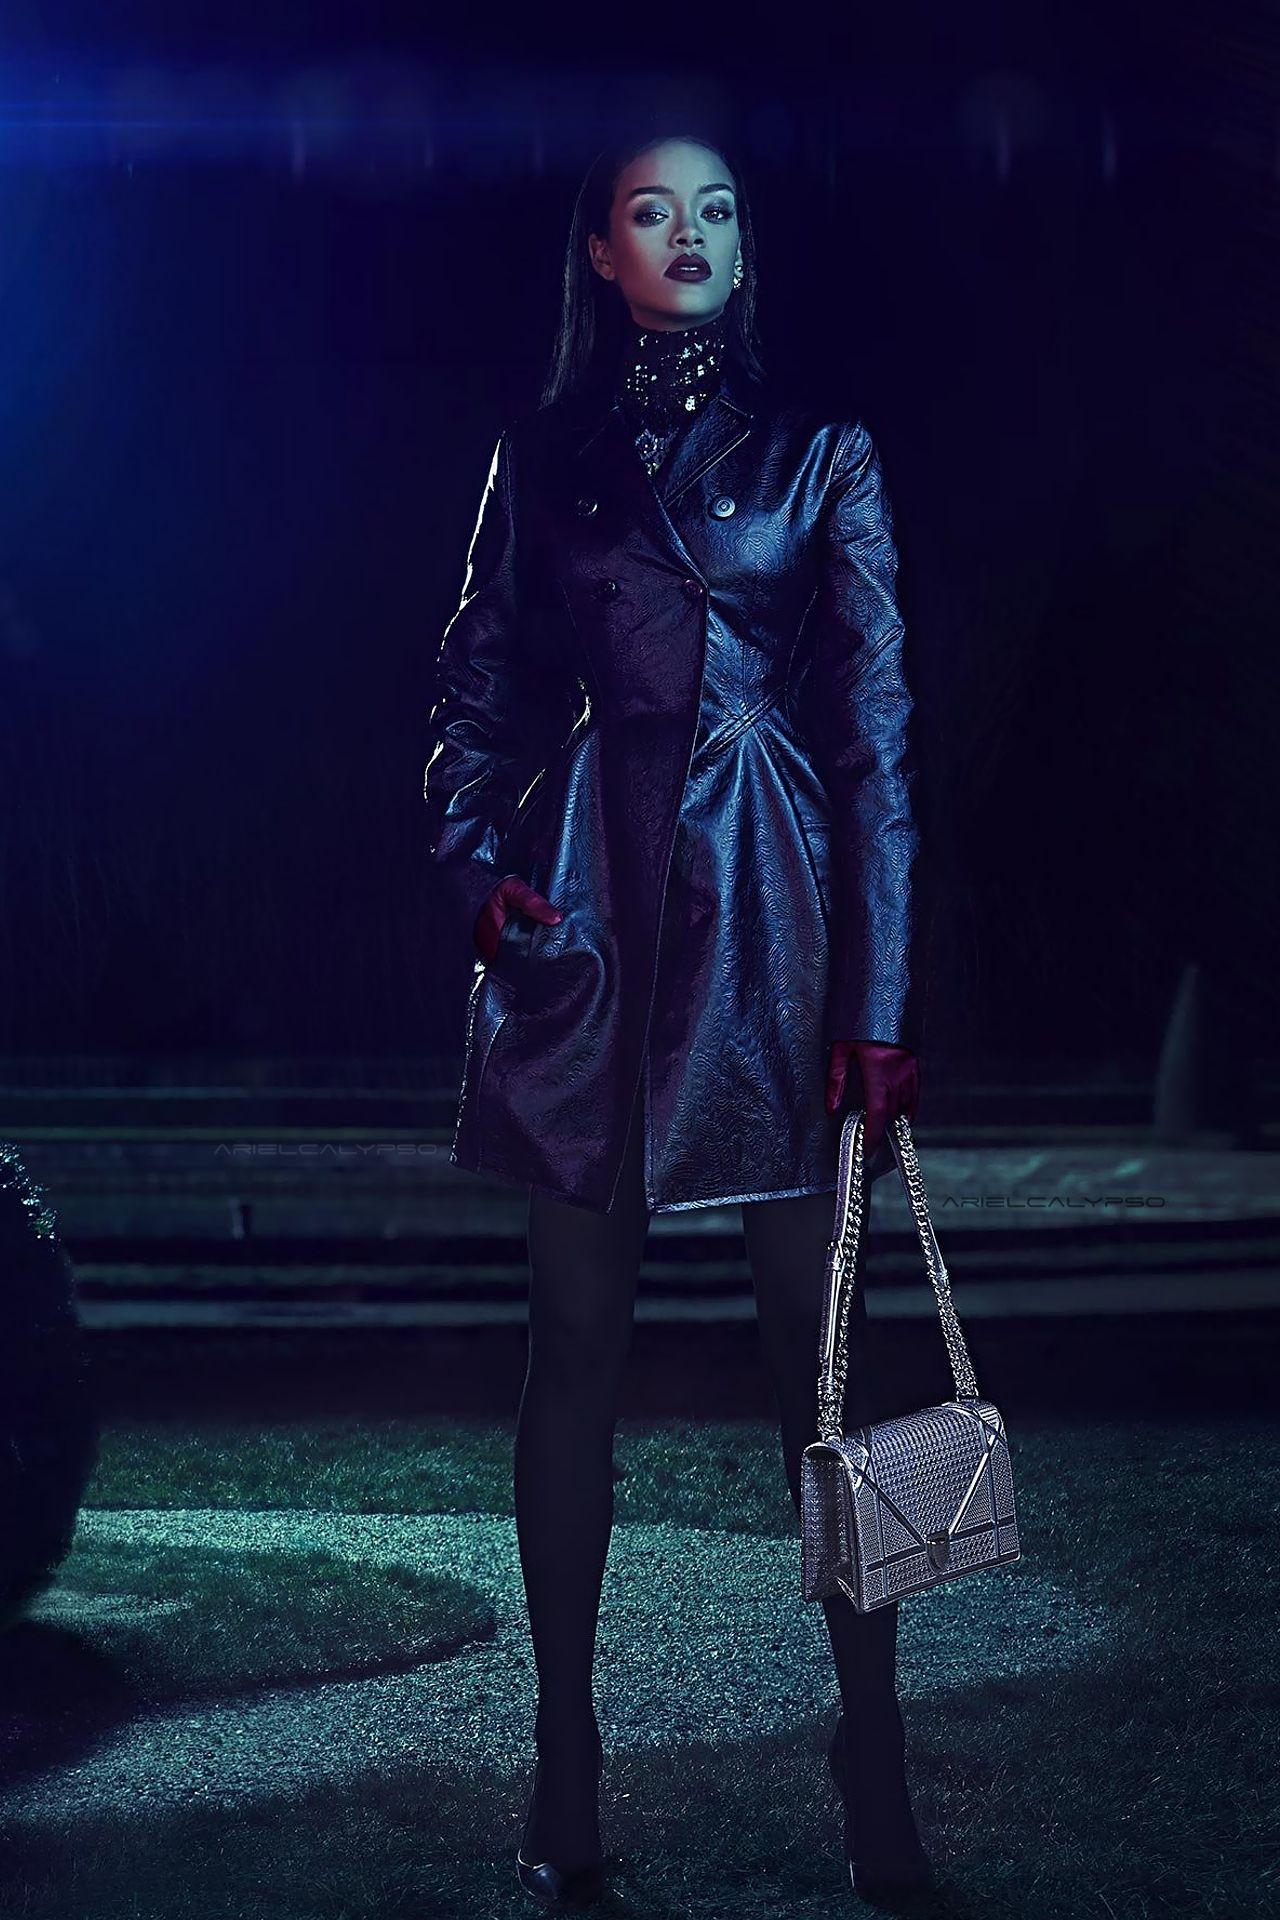 f011c61a9823 Rihanna by Steven Klein for Dior Secret Garden 2015